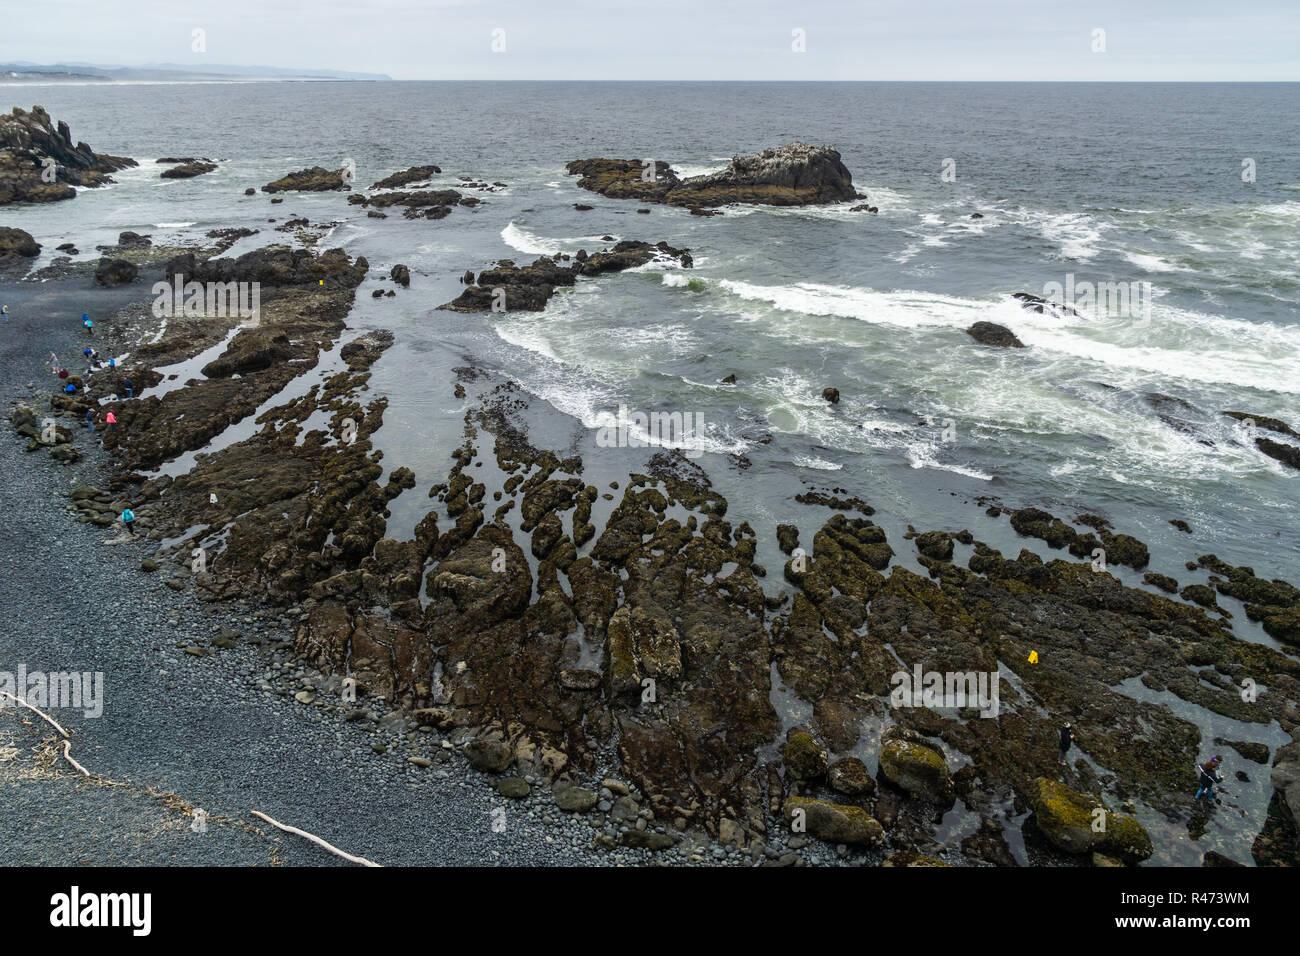 Cobble Beach overlook, Yaquina Head Outstanding Natural Area, Newport, Oregon Coast, USA. - Stock Image